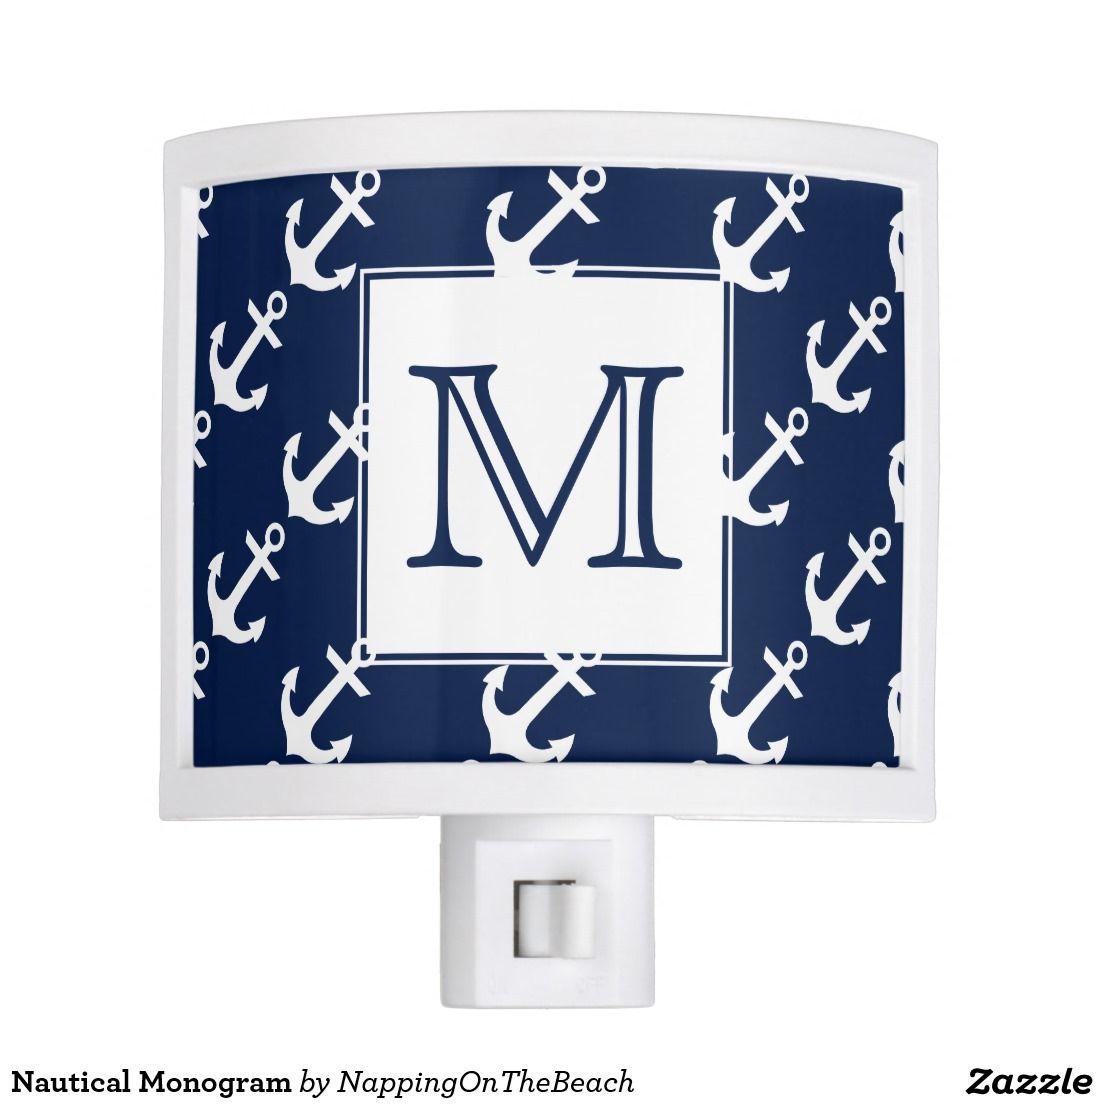 Nautical Monogram Nite Lites